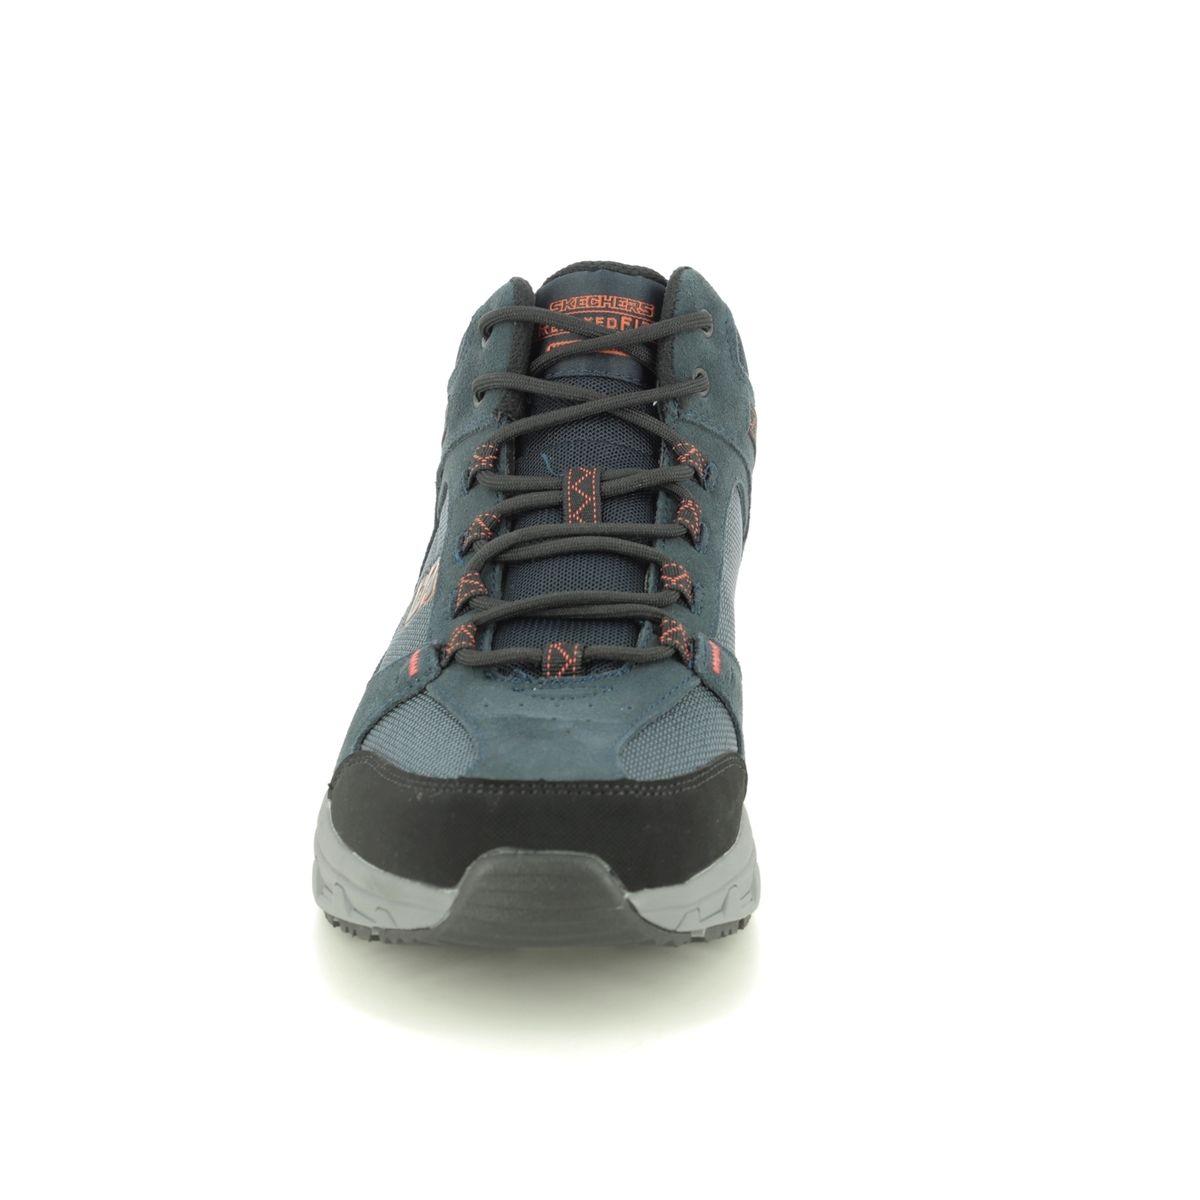 Al frente Virgen Adversario  Skechers Oak Canyon Boot Relaxed Fit 51895 NVOR Navy Outdoor Walking Boots